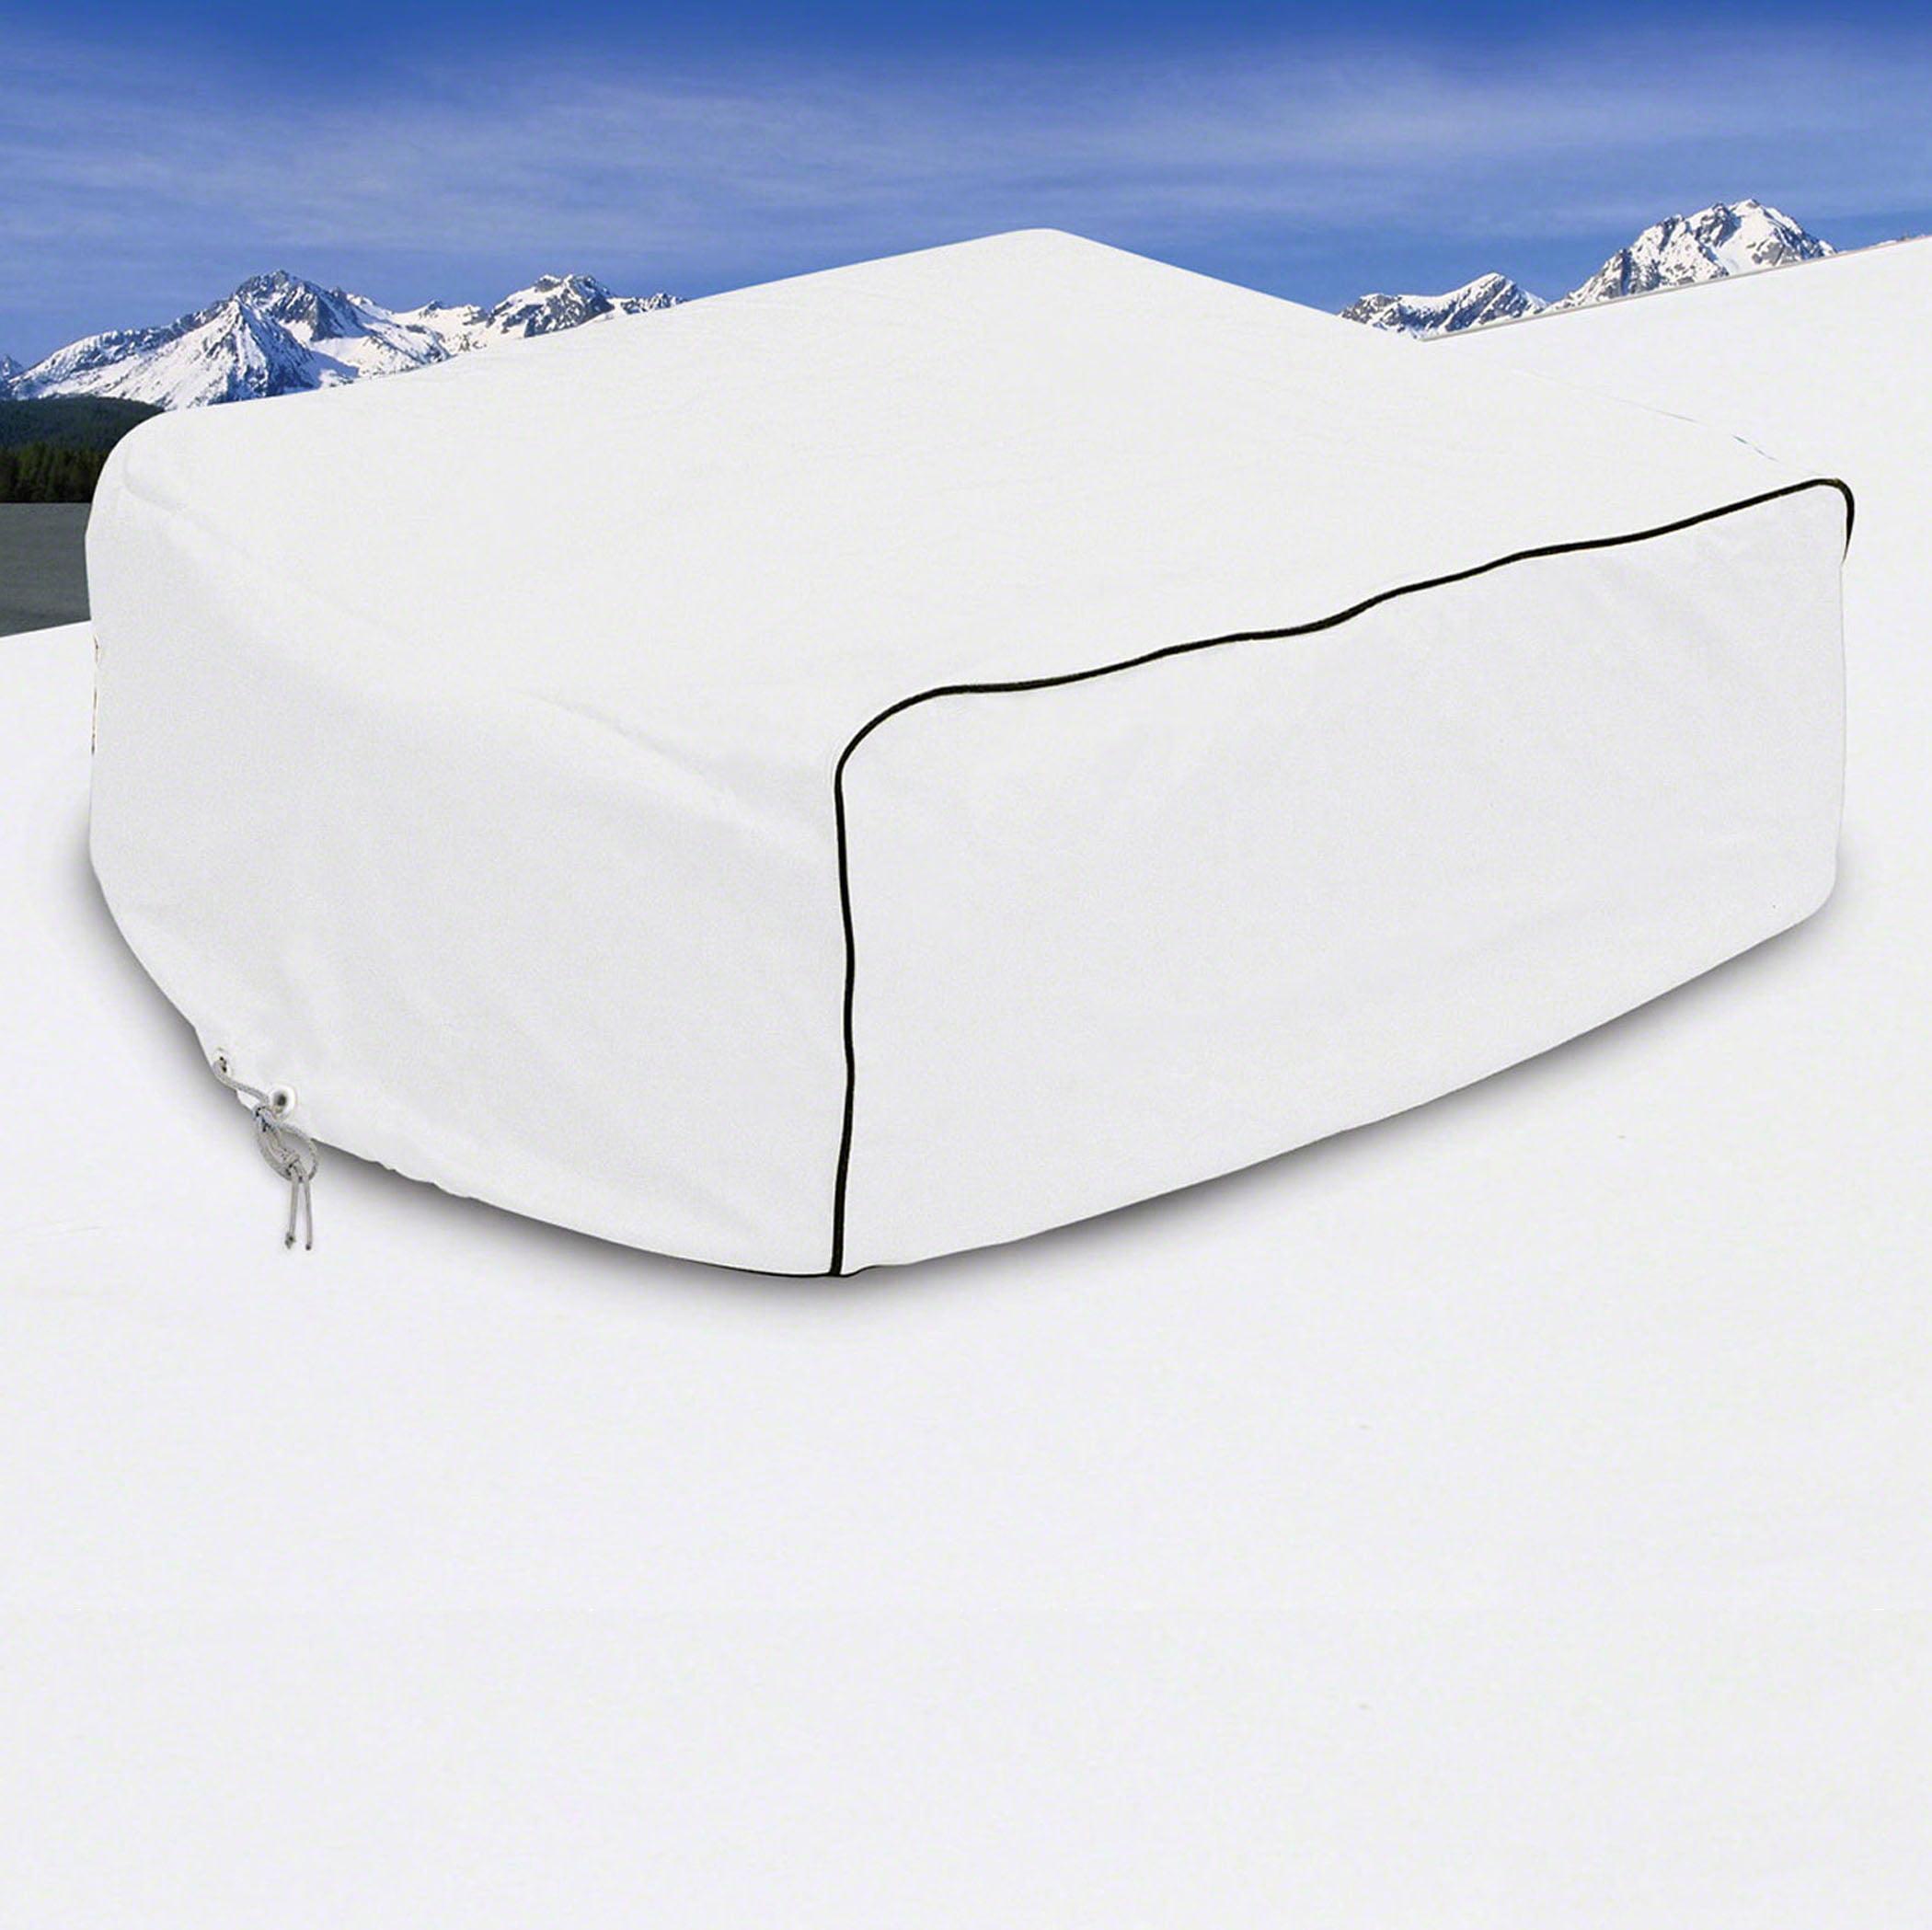 Classic Accessories OverDrive RV Air Conditioner Storage Cover, White